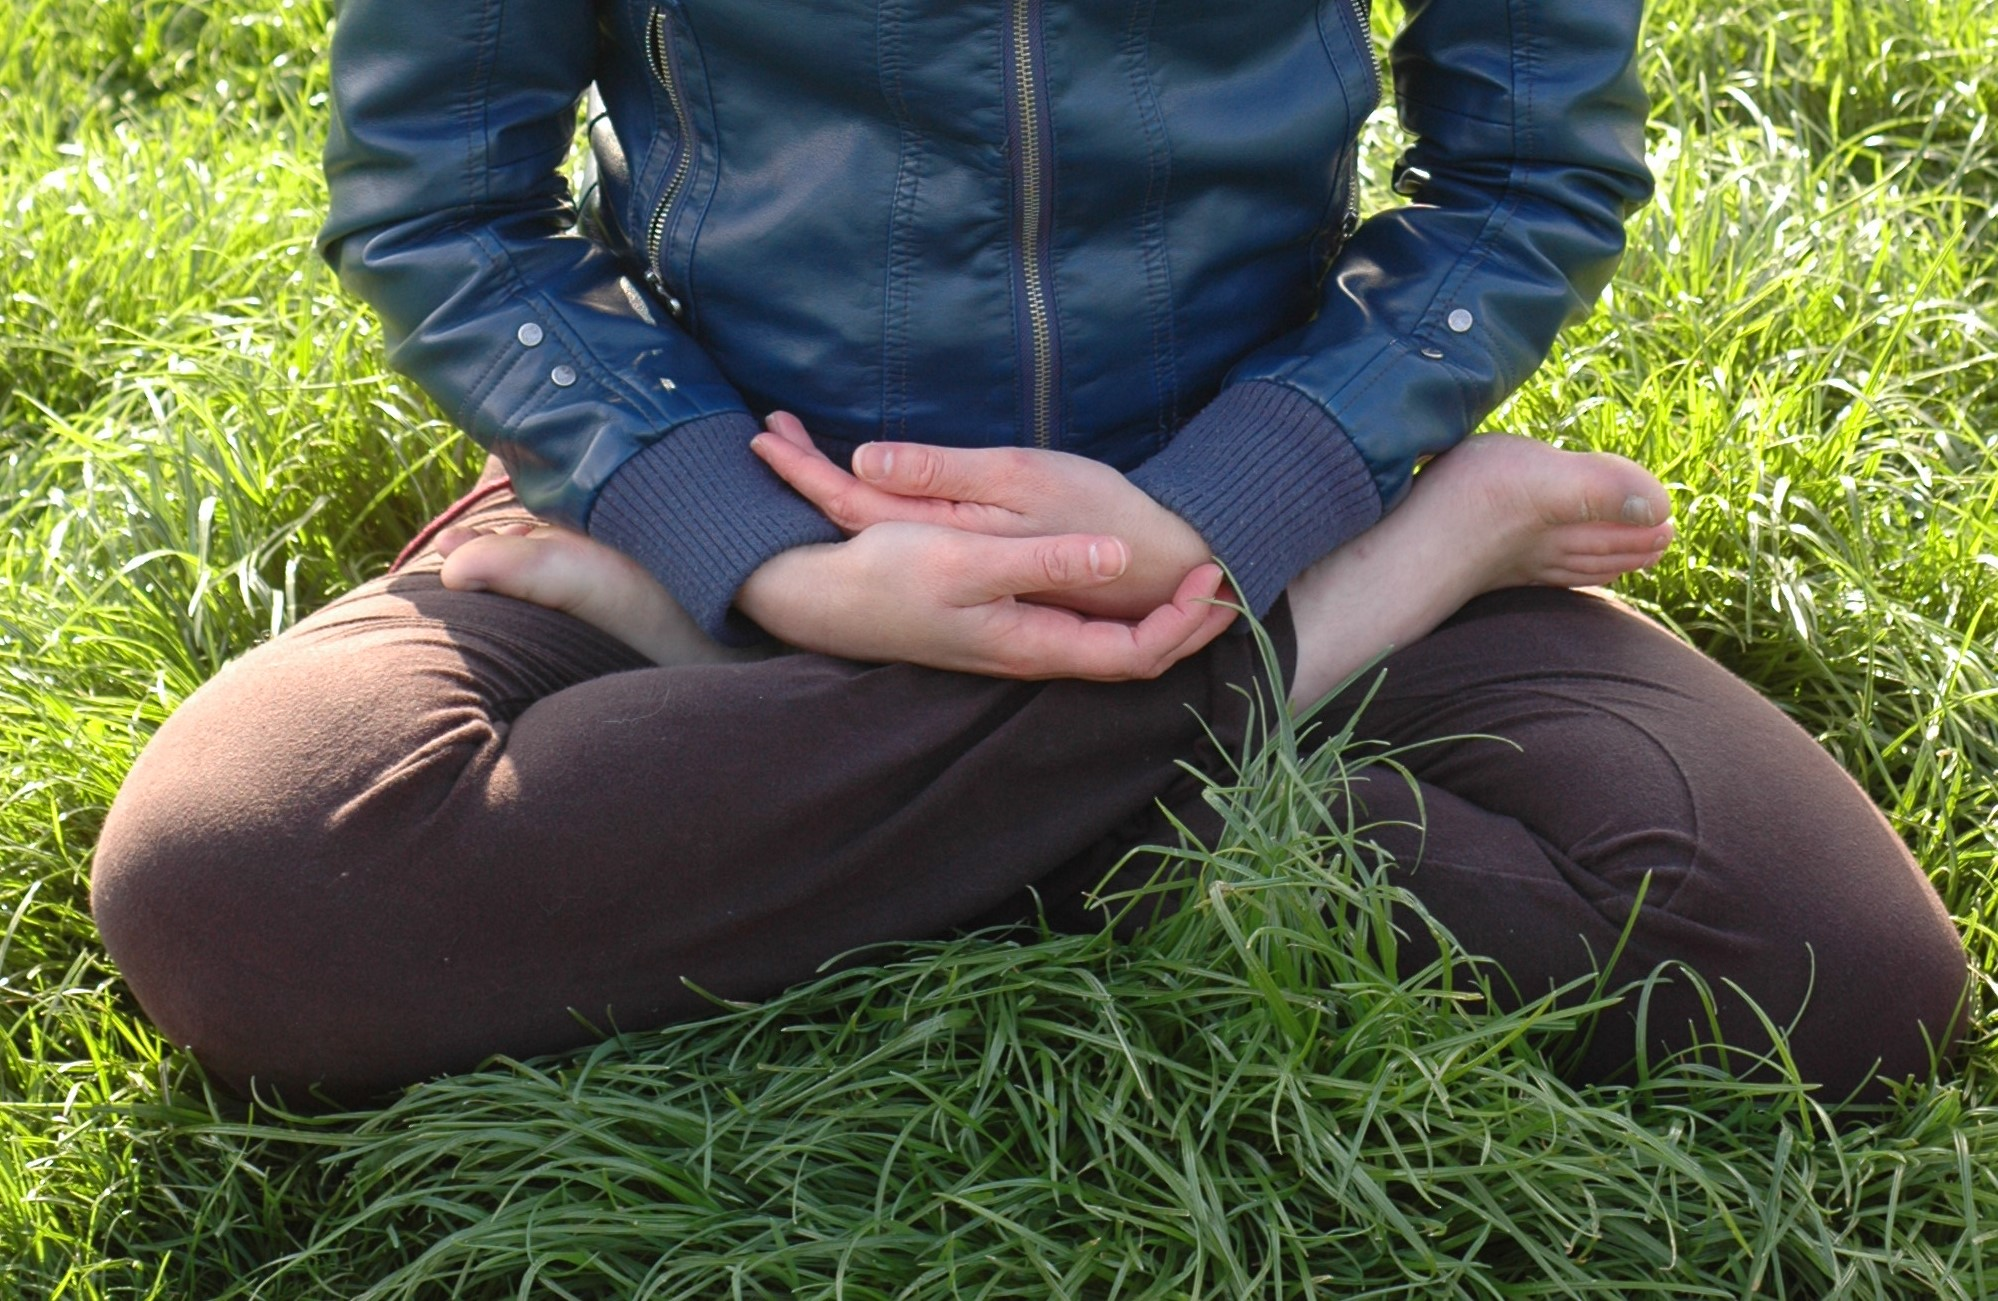 meditation hands and feet.jpg